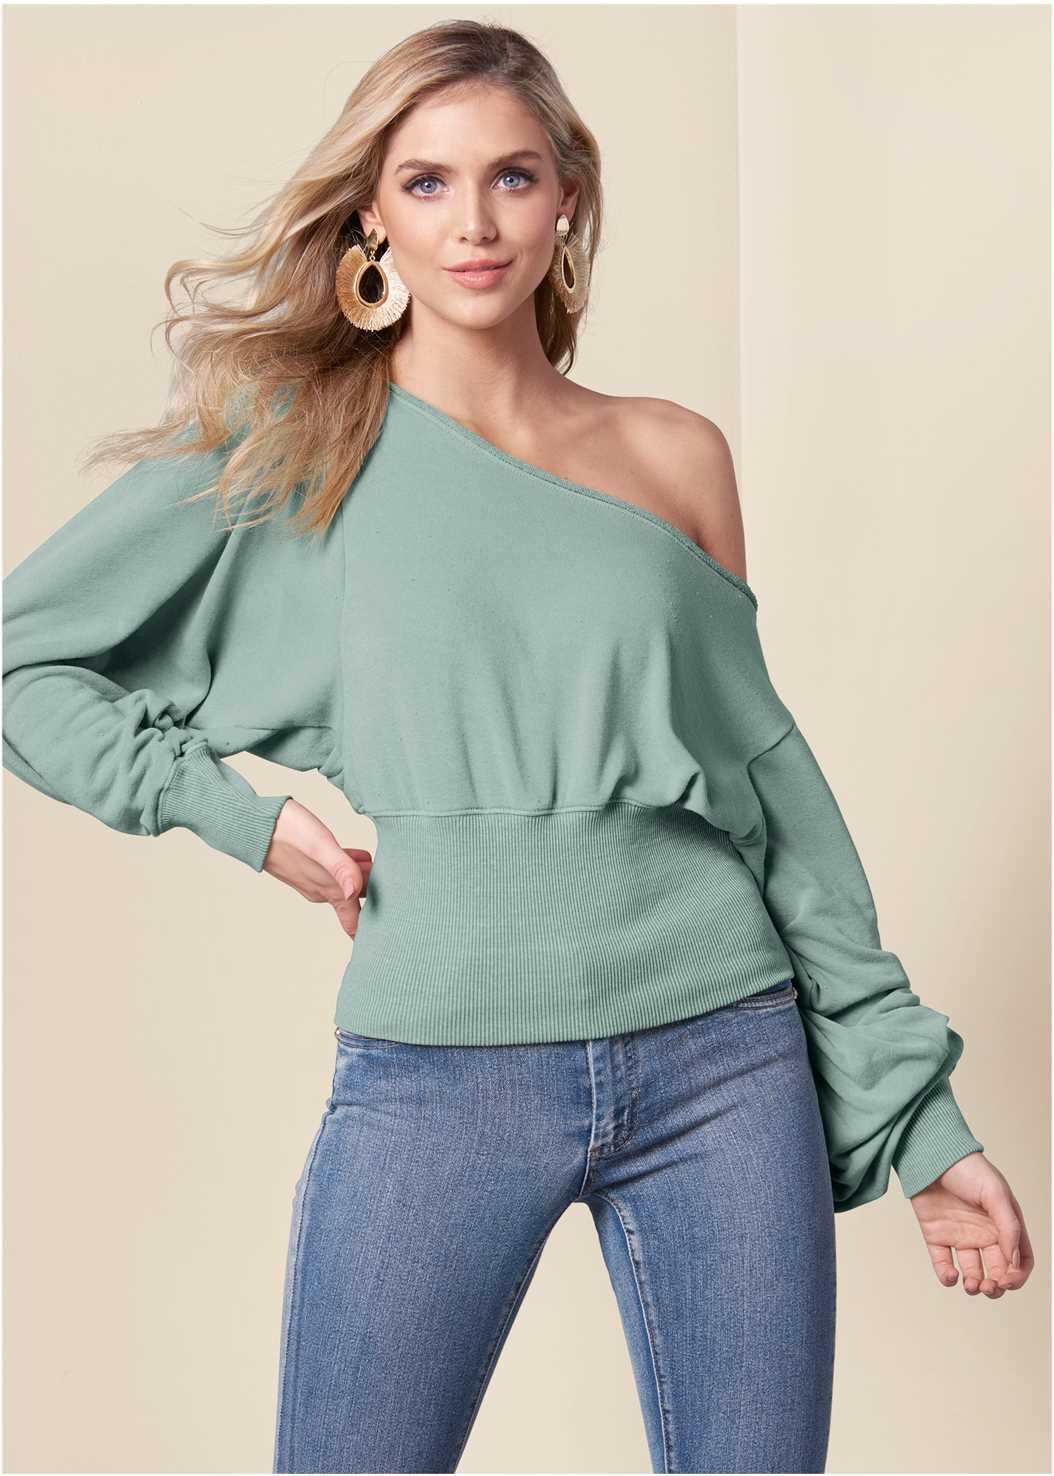 Off The Shoulder Sweatshirt,Mid Rise Color Skinny Jeans